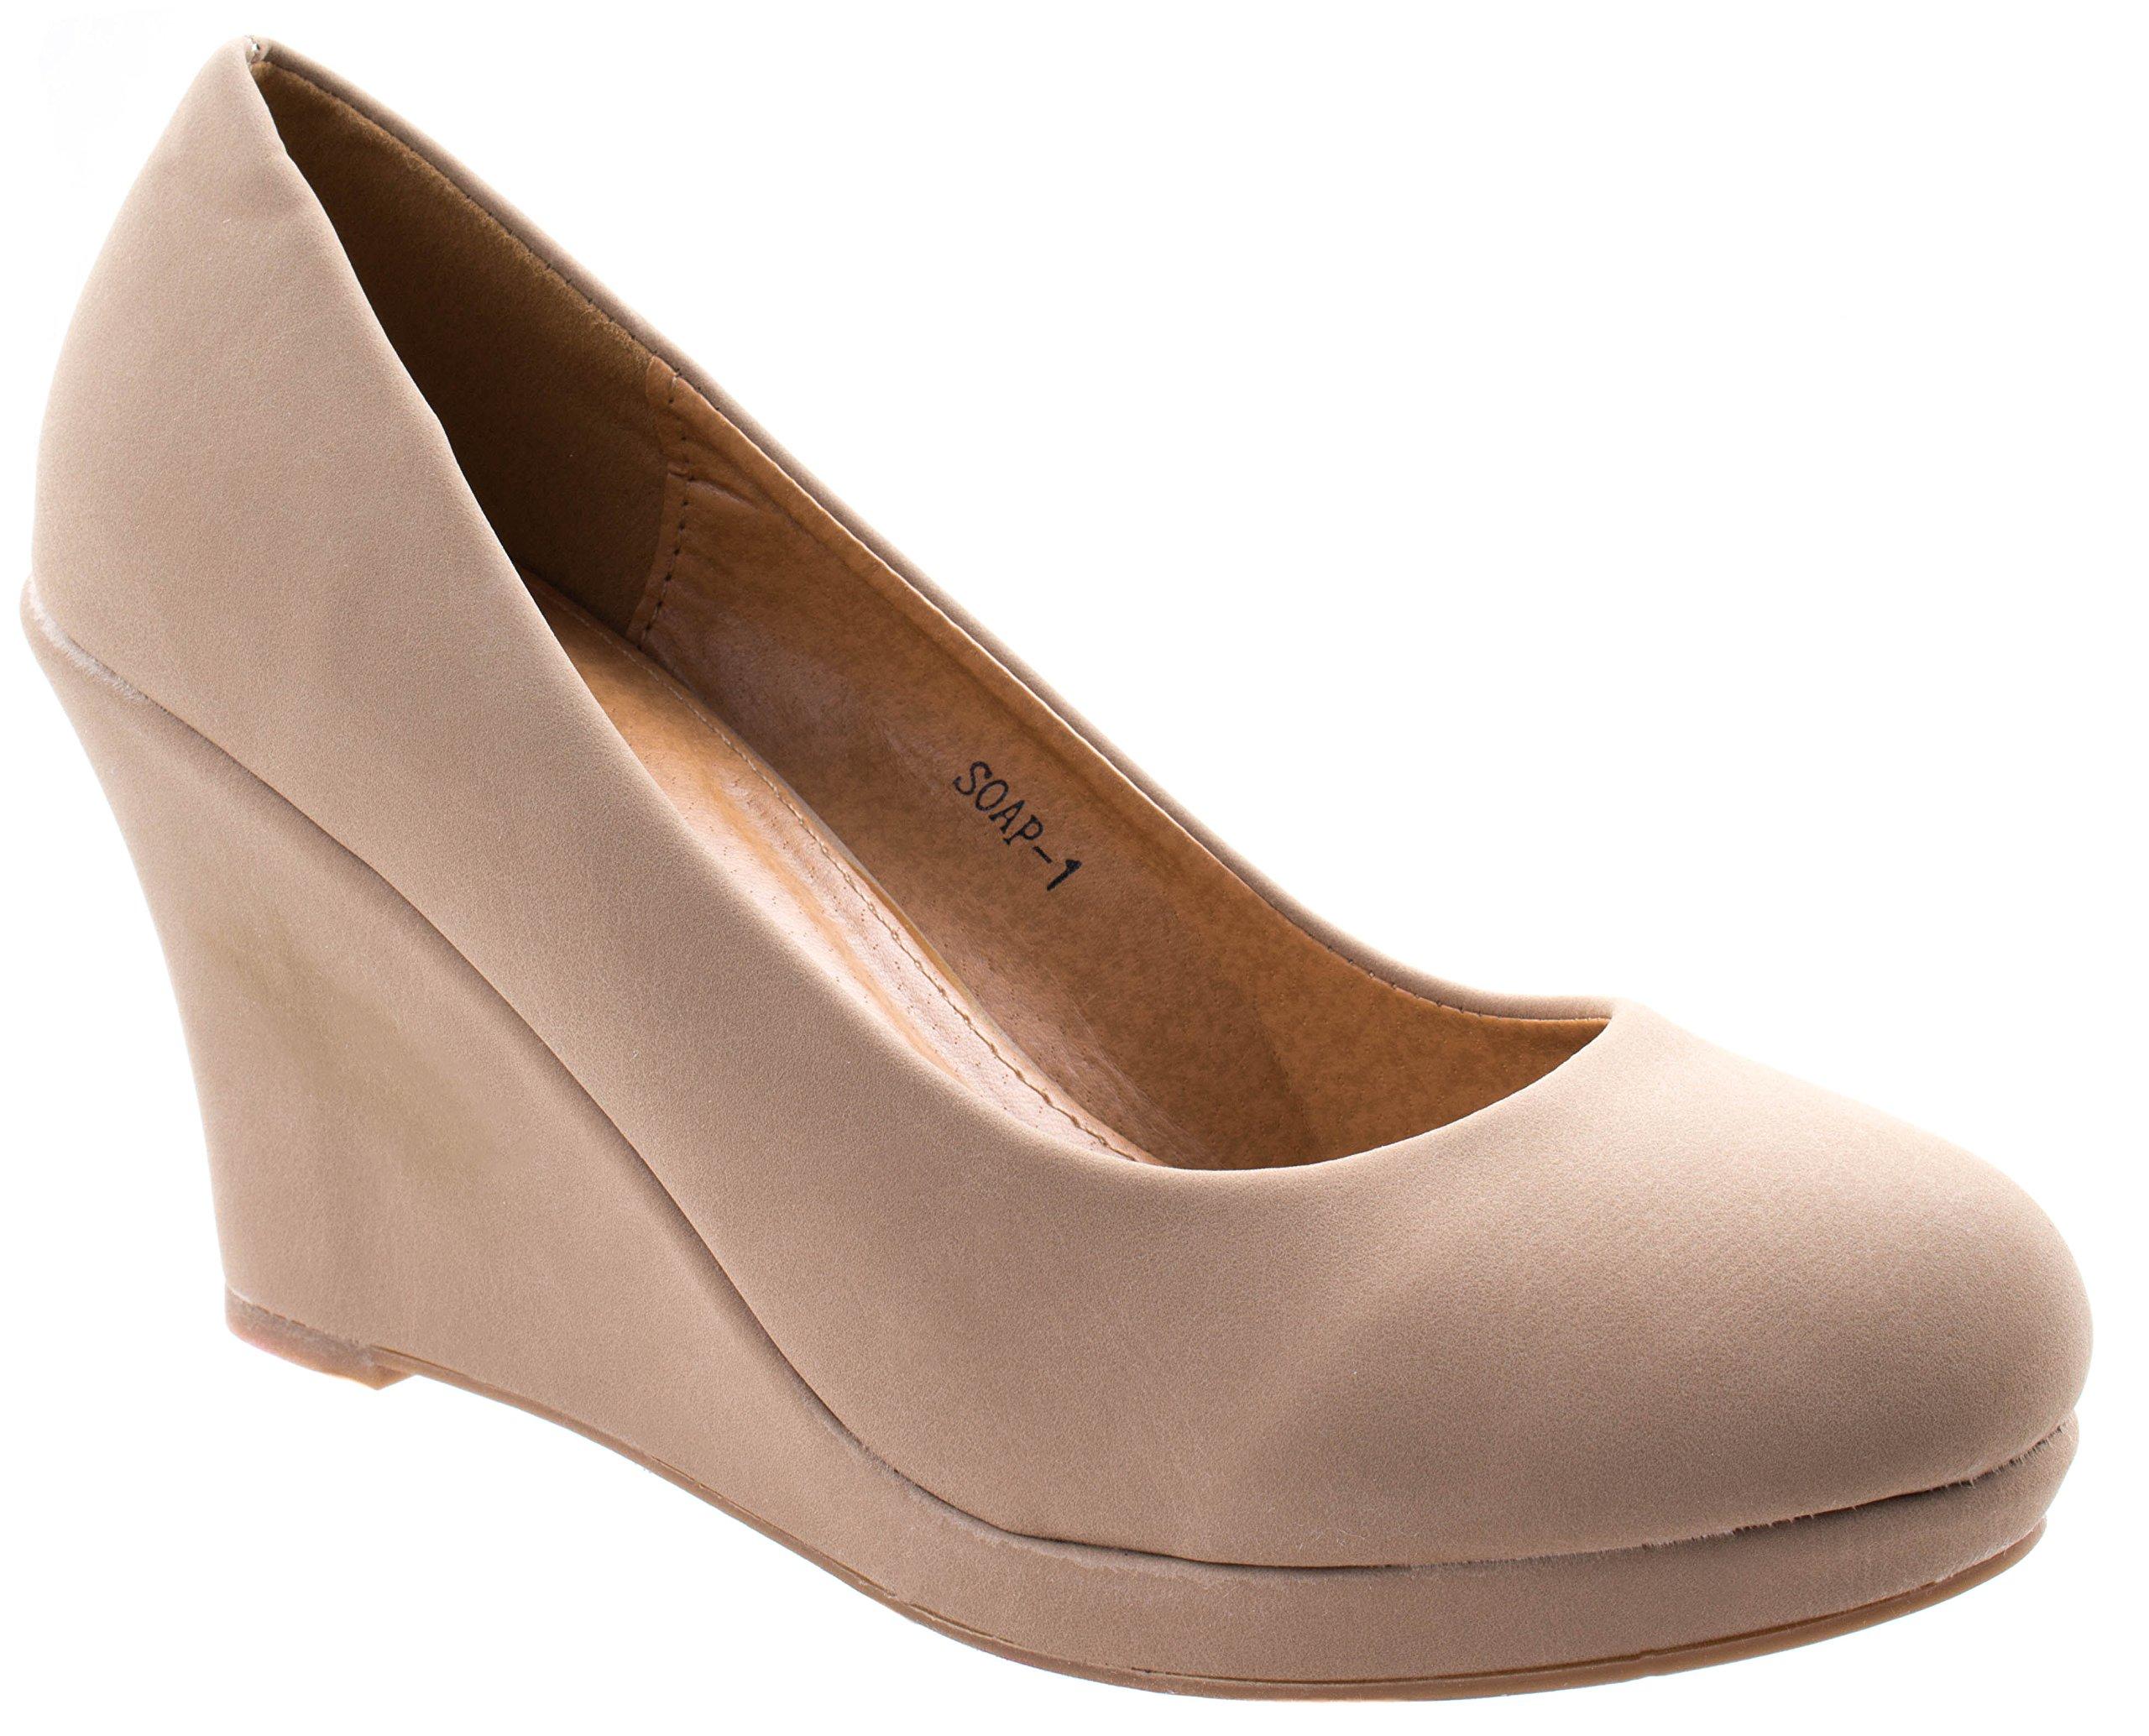 Top Moda Women's Soap-1 Beige Classic Almond Toe Slip On Low Wedge Heel Pumps 6 D(M) US